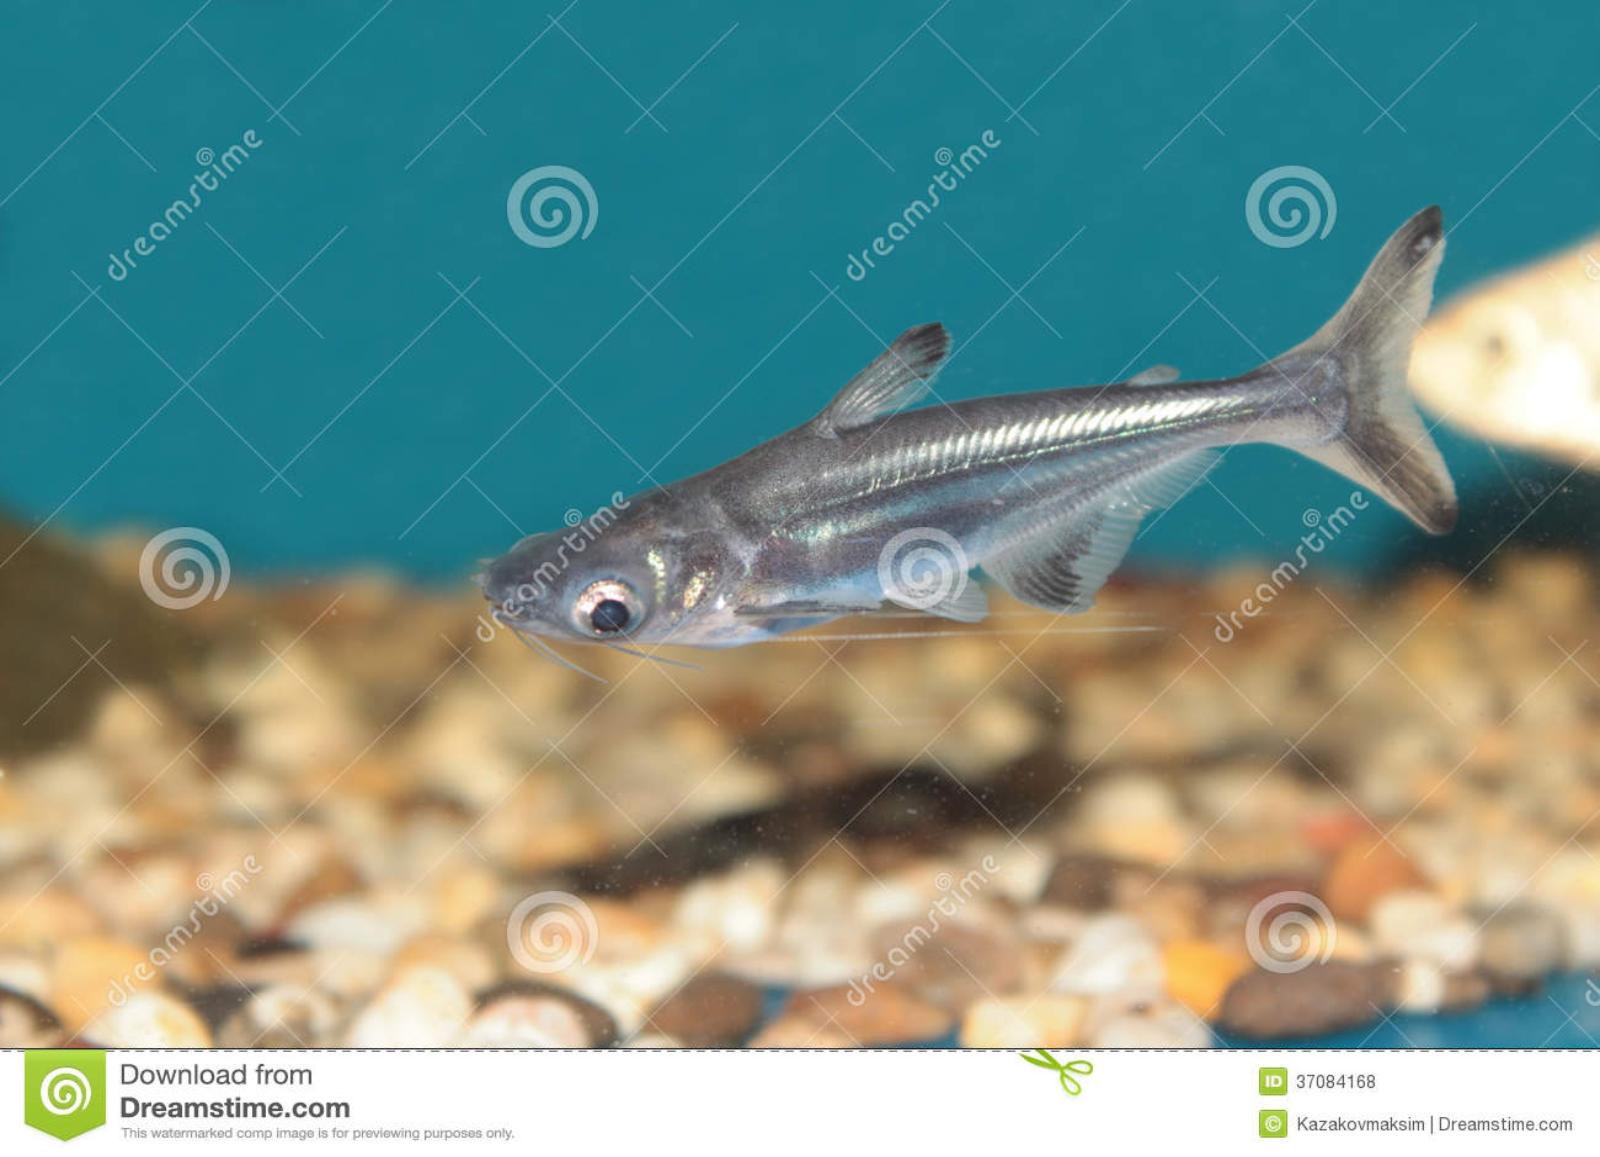 Iridescent shark aquarium fish royalty free stock photos for Shark fish for aquarium